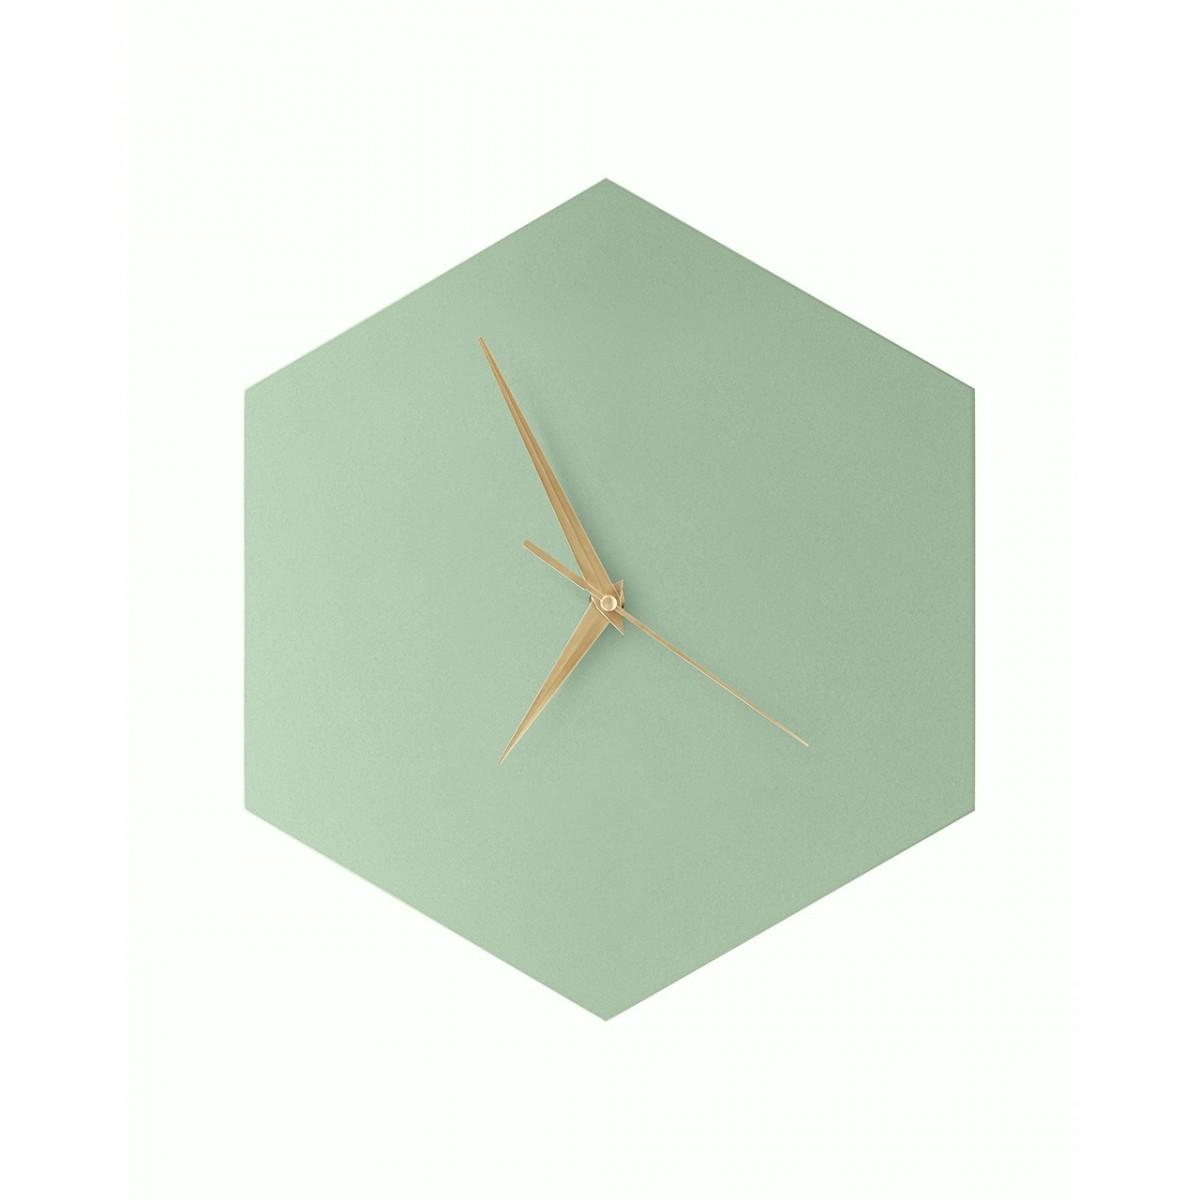 WOOD U? WATCH - Wanduhr mit schicker Linoleumoberfläche - Mint